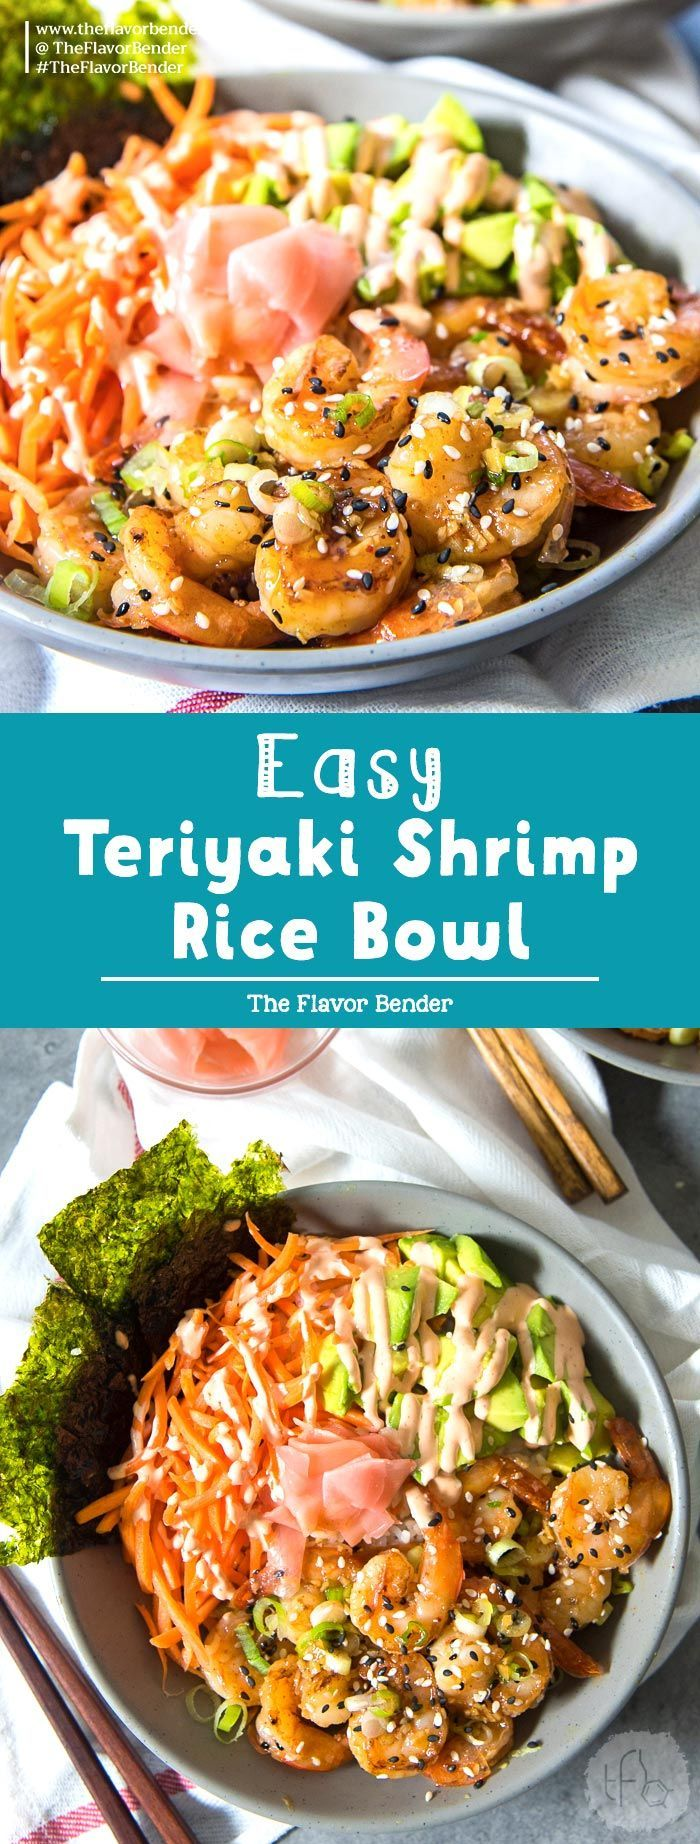 Easy Teriyaki Shrimp Rice bowls - Sweet and spicy shrimp ...